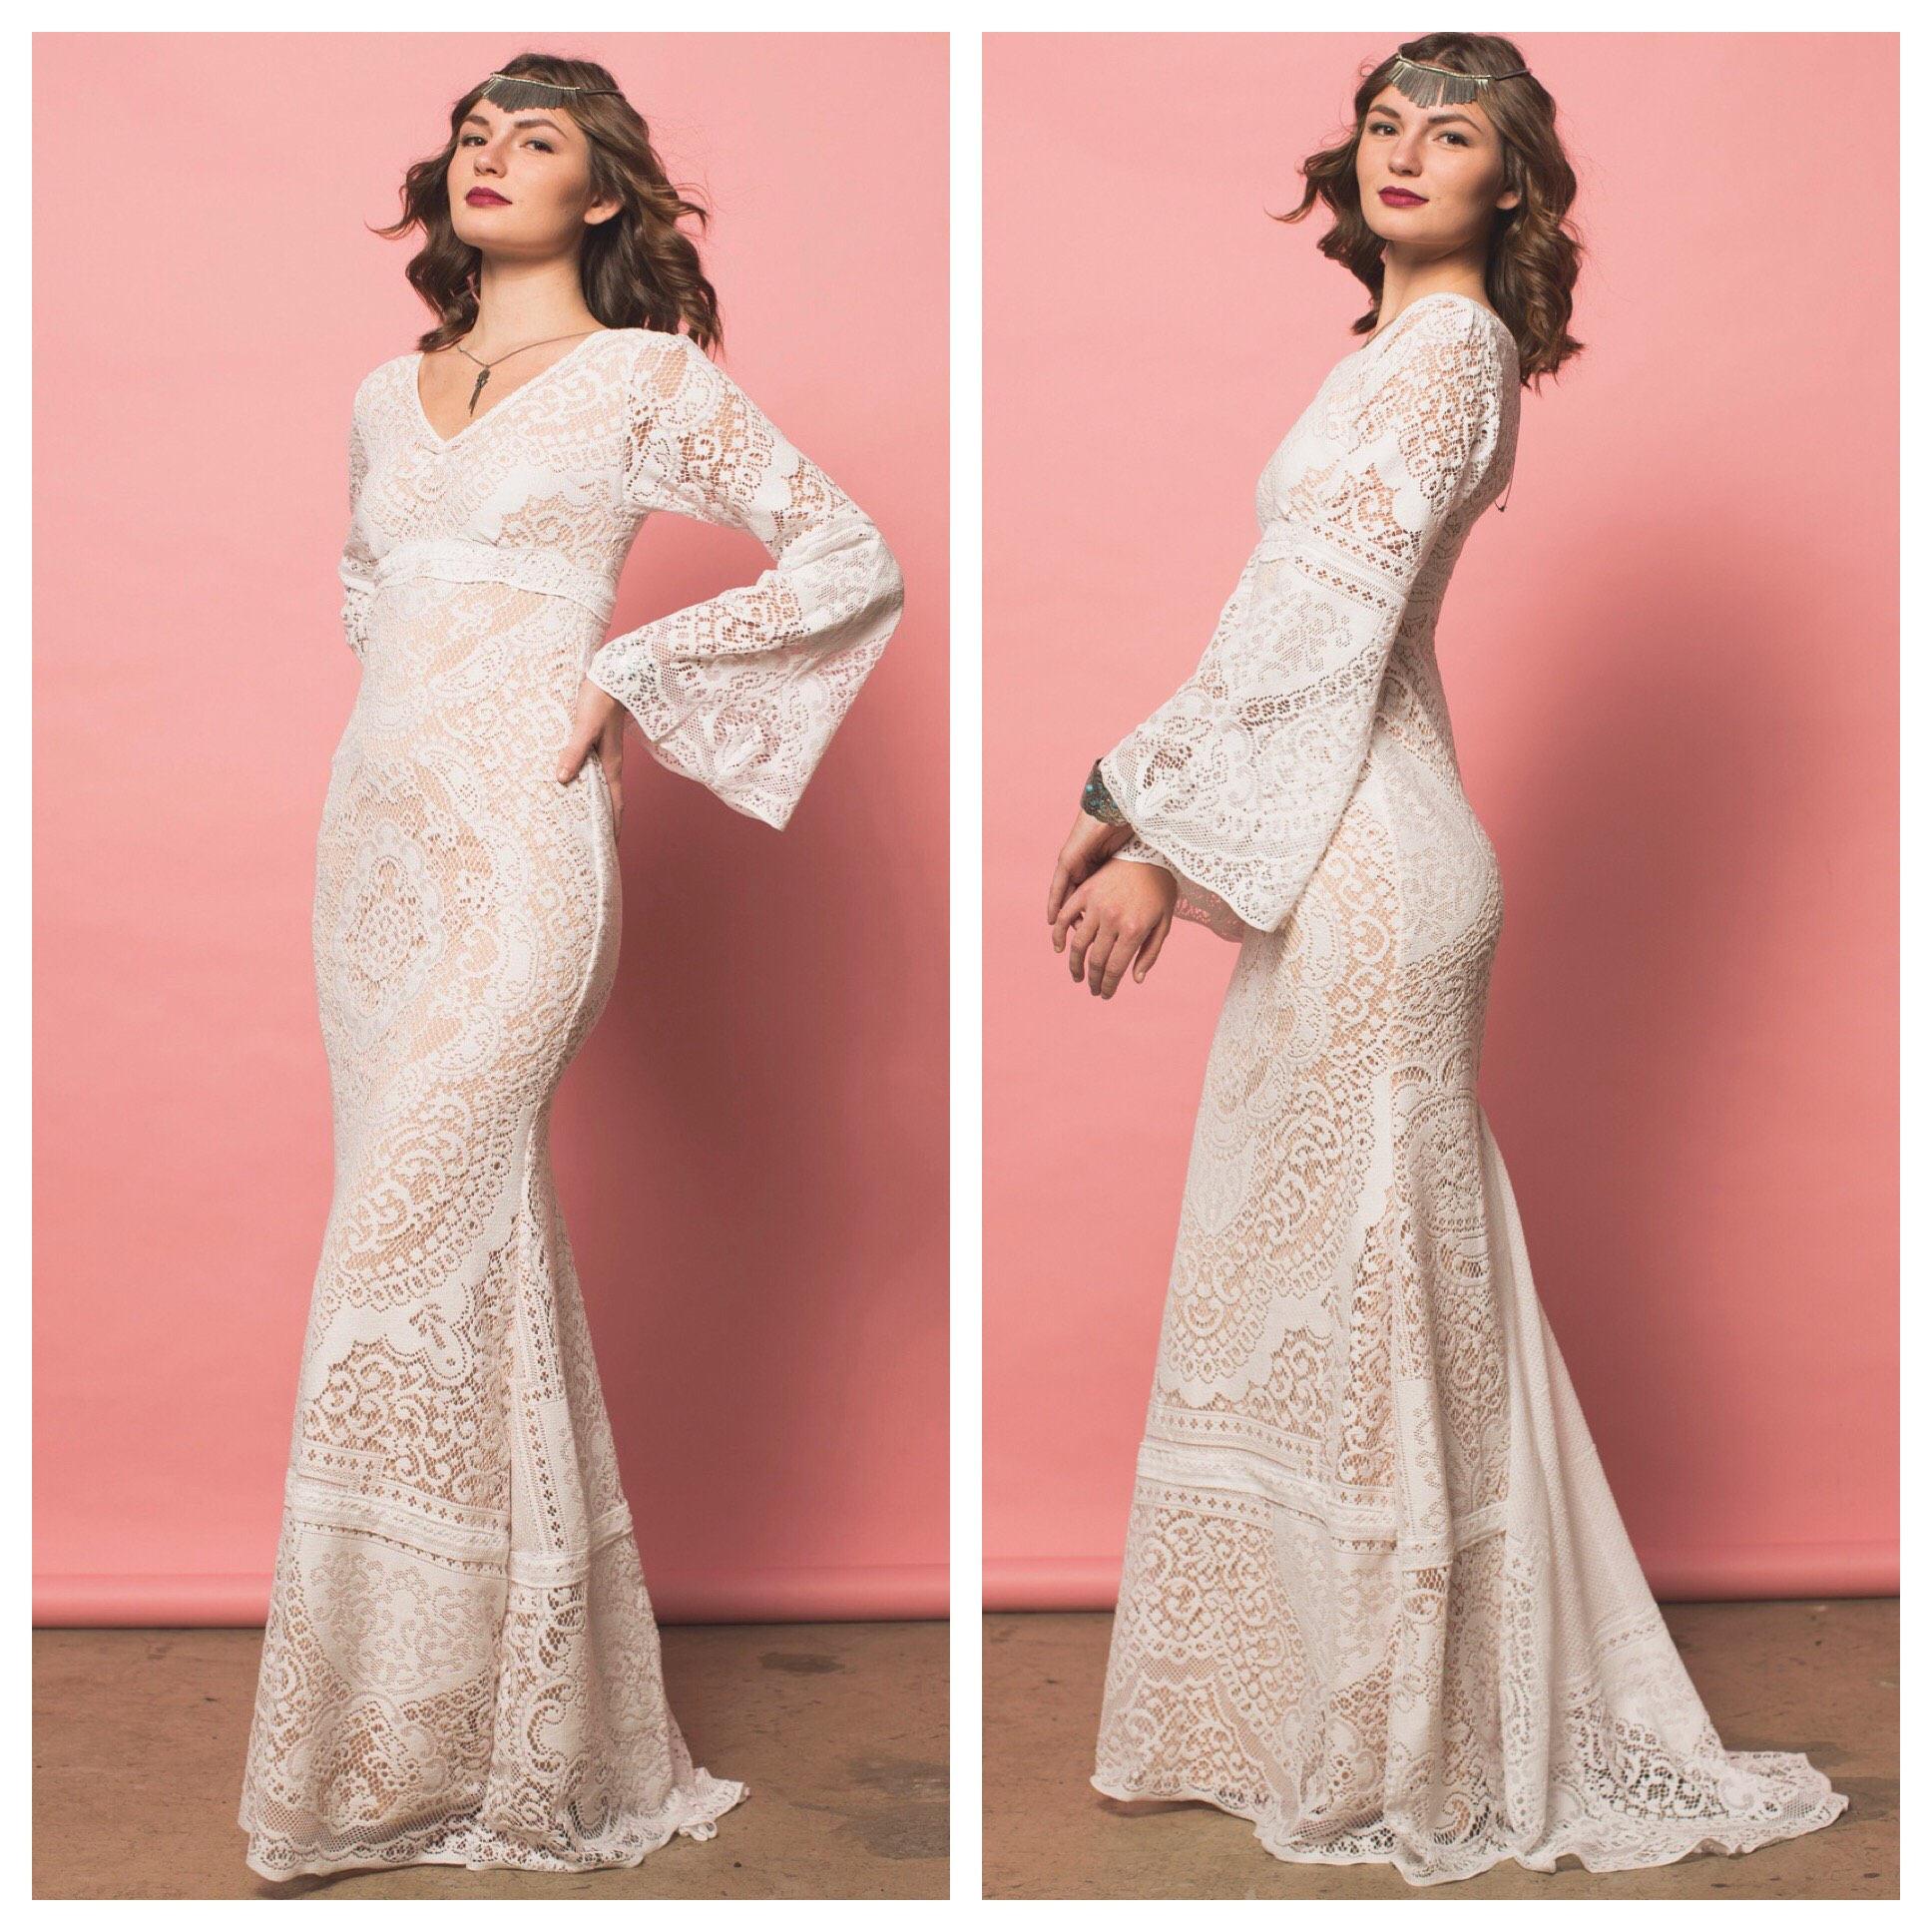 Wedding dress lace wedding dress boho wedding dress boho